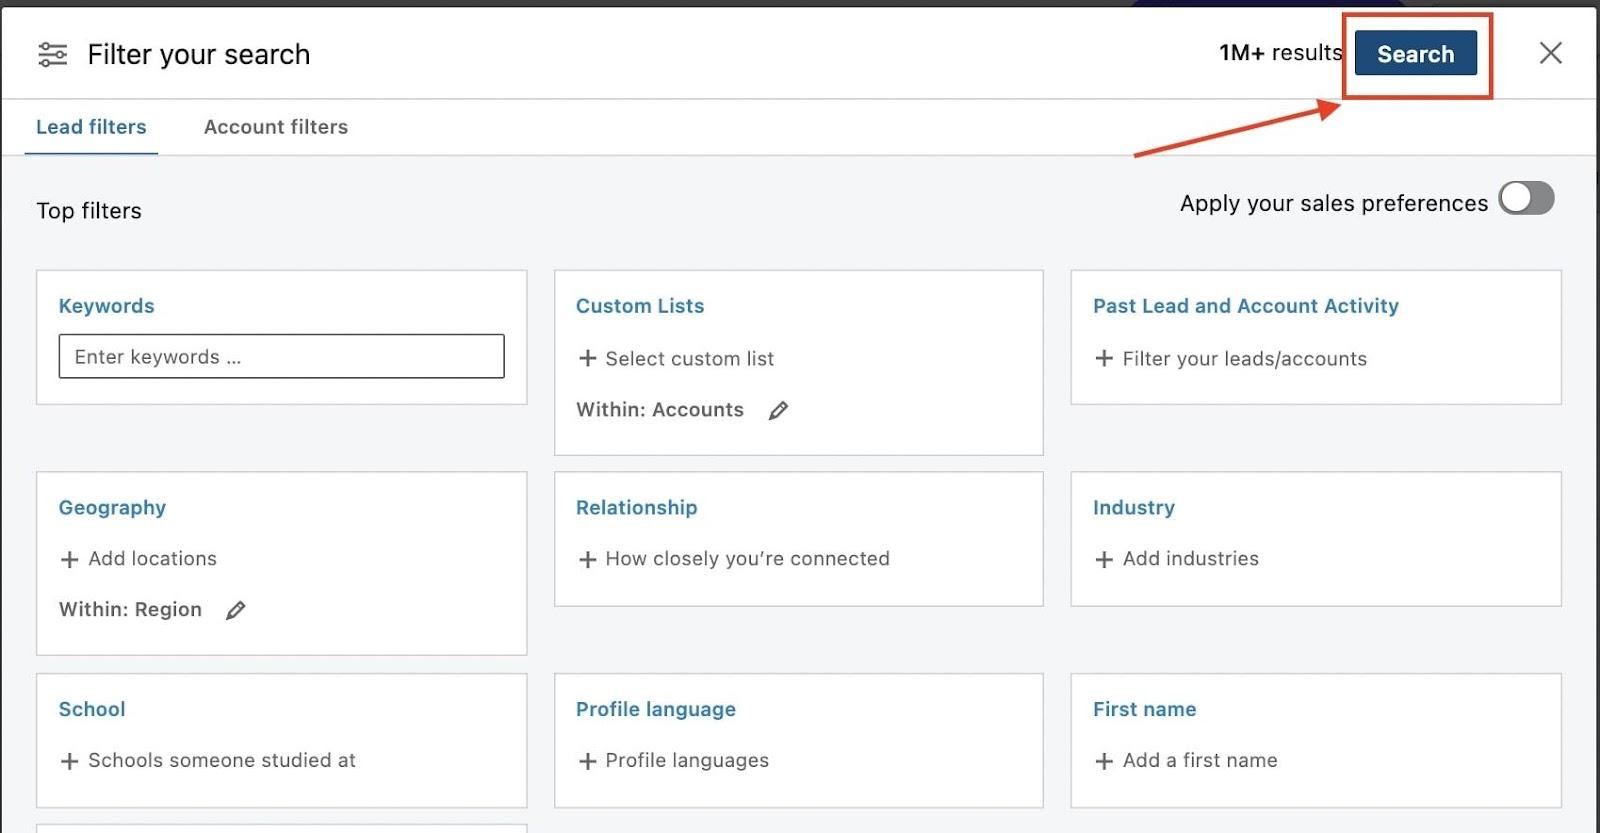 linkedin-sales-navigator-search-engine.jpg